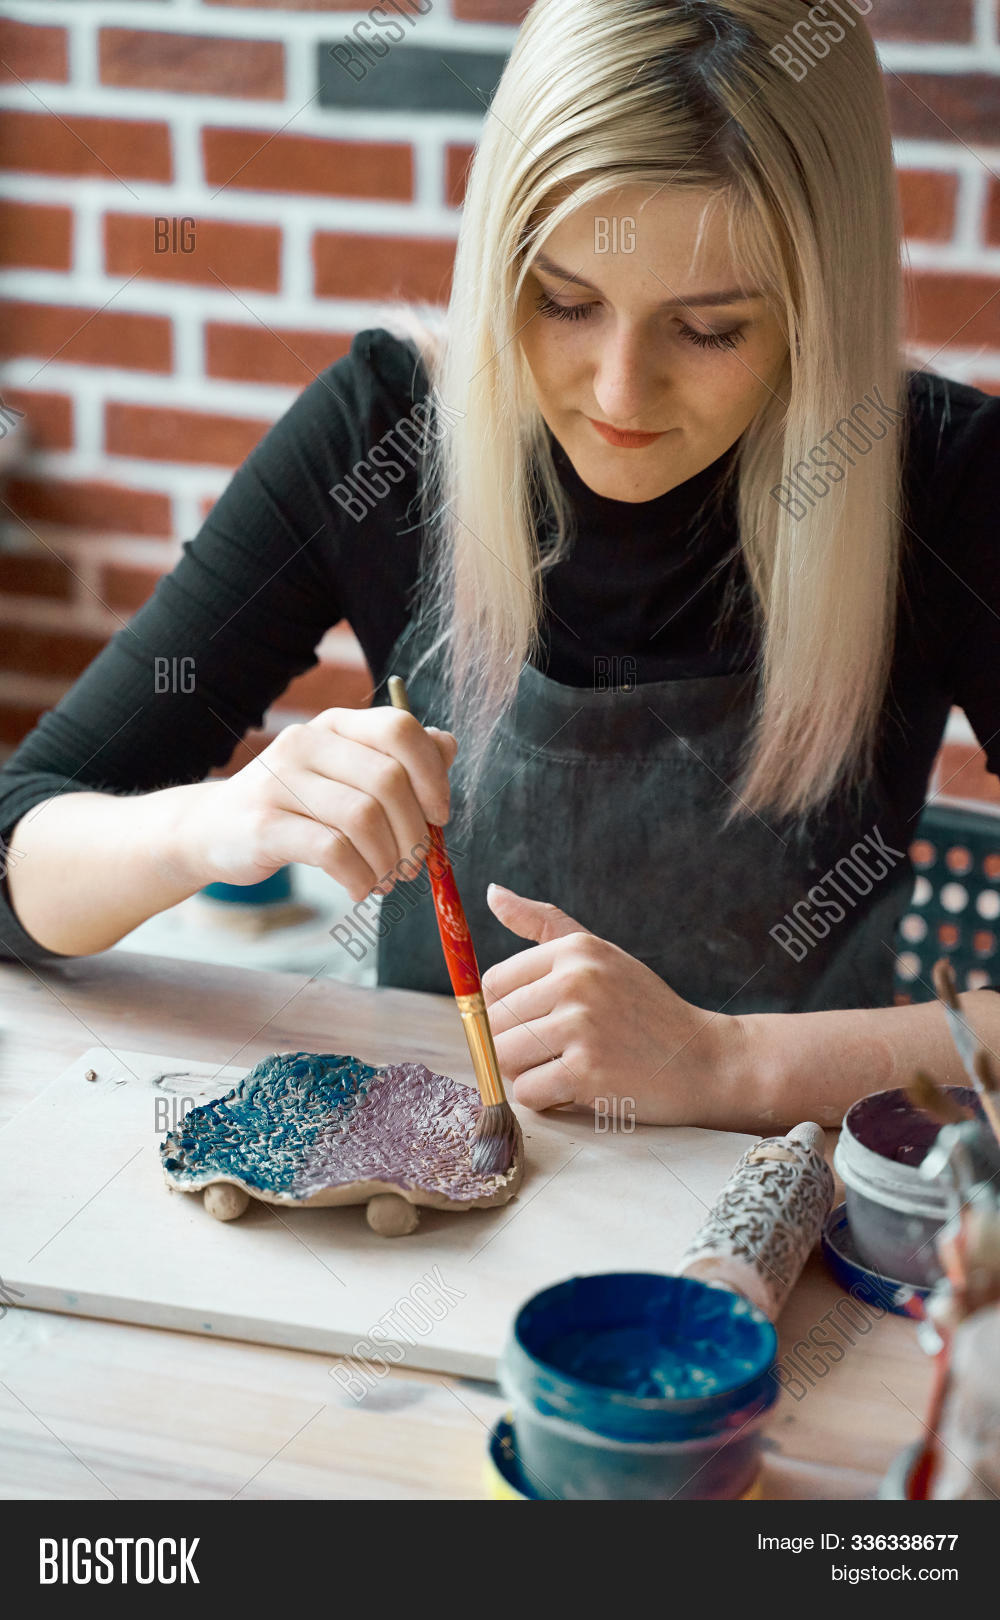 artisan,artist,billet,blue,brush,business,ceramic,clay,craft,craftsman,creation,creative,creativity,earthenware,faceless,finger,form,freelance,hand,handcraft,handwork,hobby,ingot,learning,making,master,molding,mud,occupation,paint,pattern,people,plate,pottery,sculptor,shape,table,turn,unrecognised,vertical,wet,work,working,workpiece,workshop